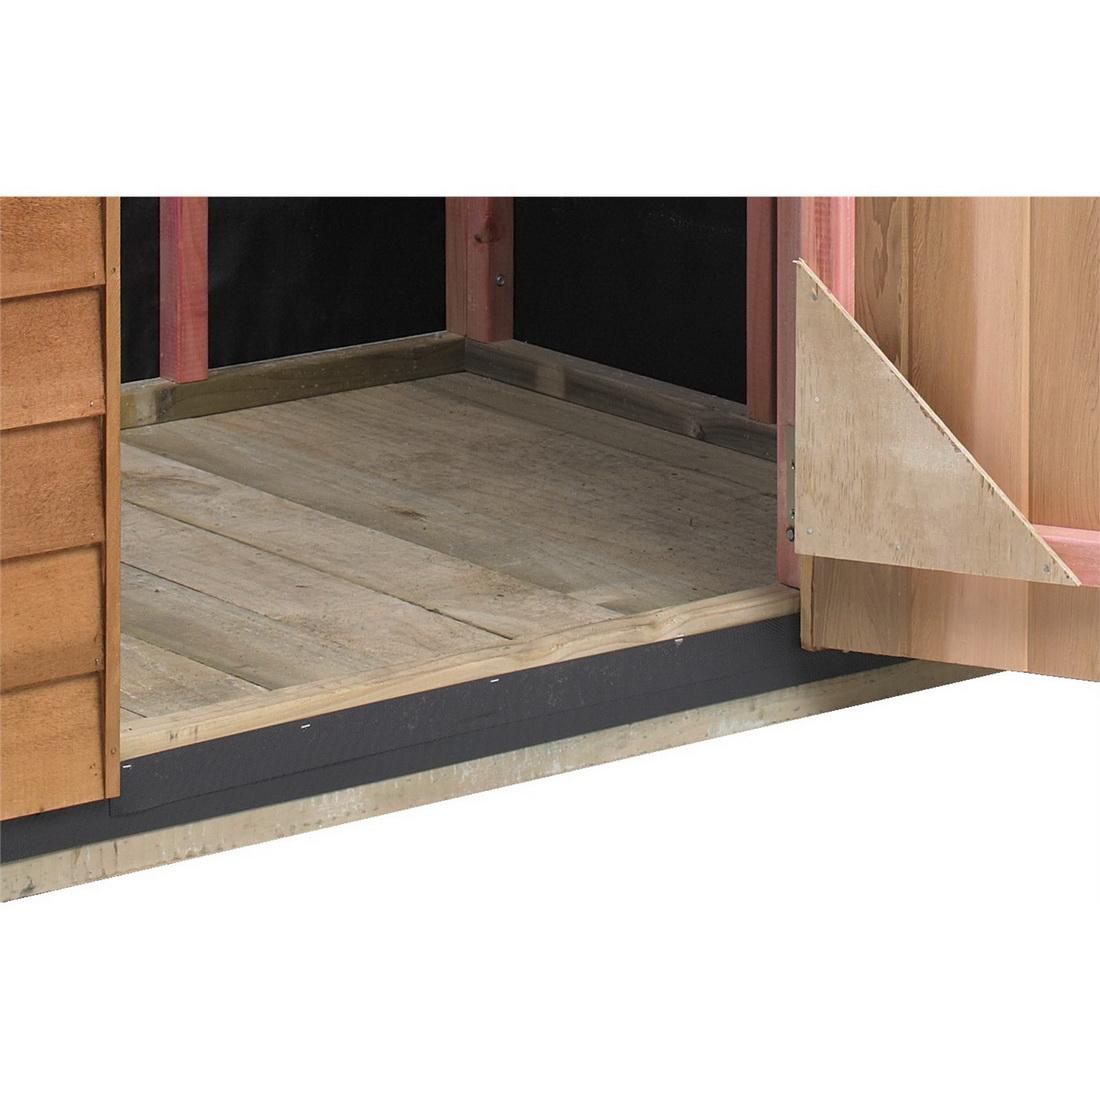 Woodridge Garden Shed Timber Floor Kit